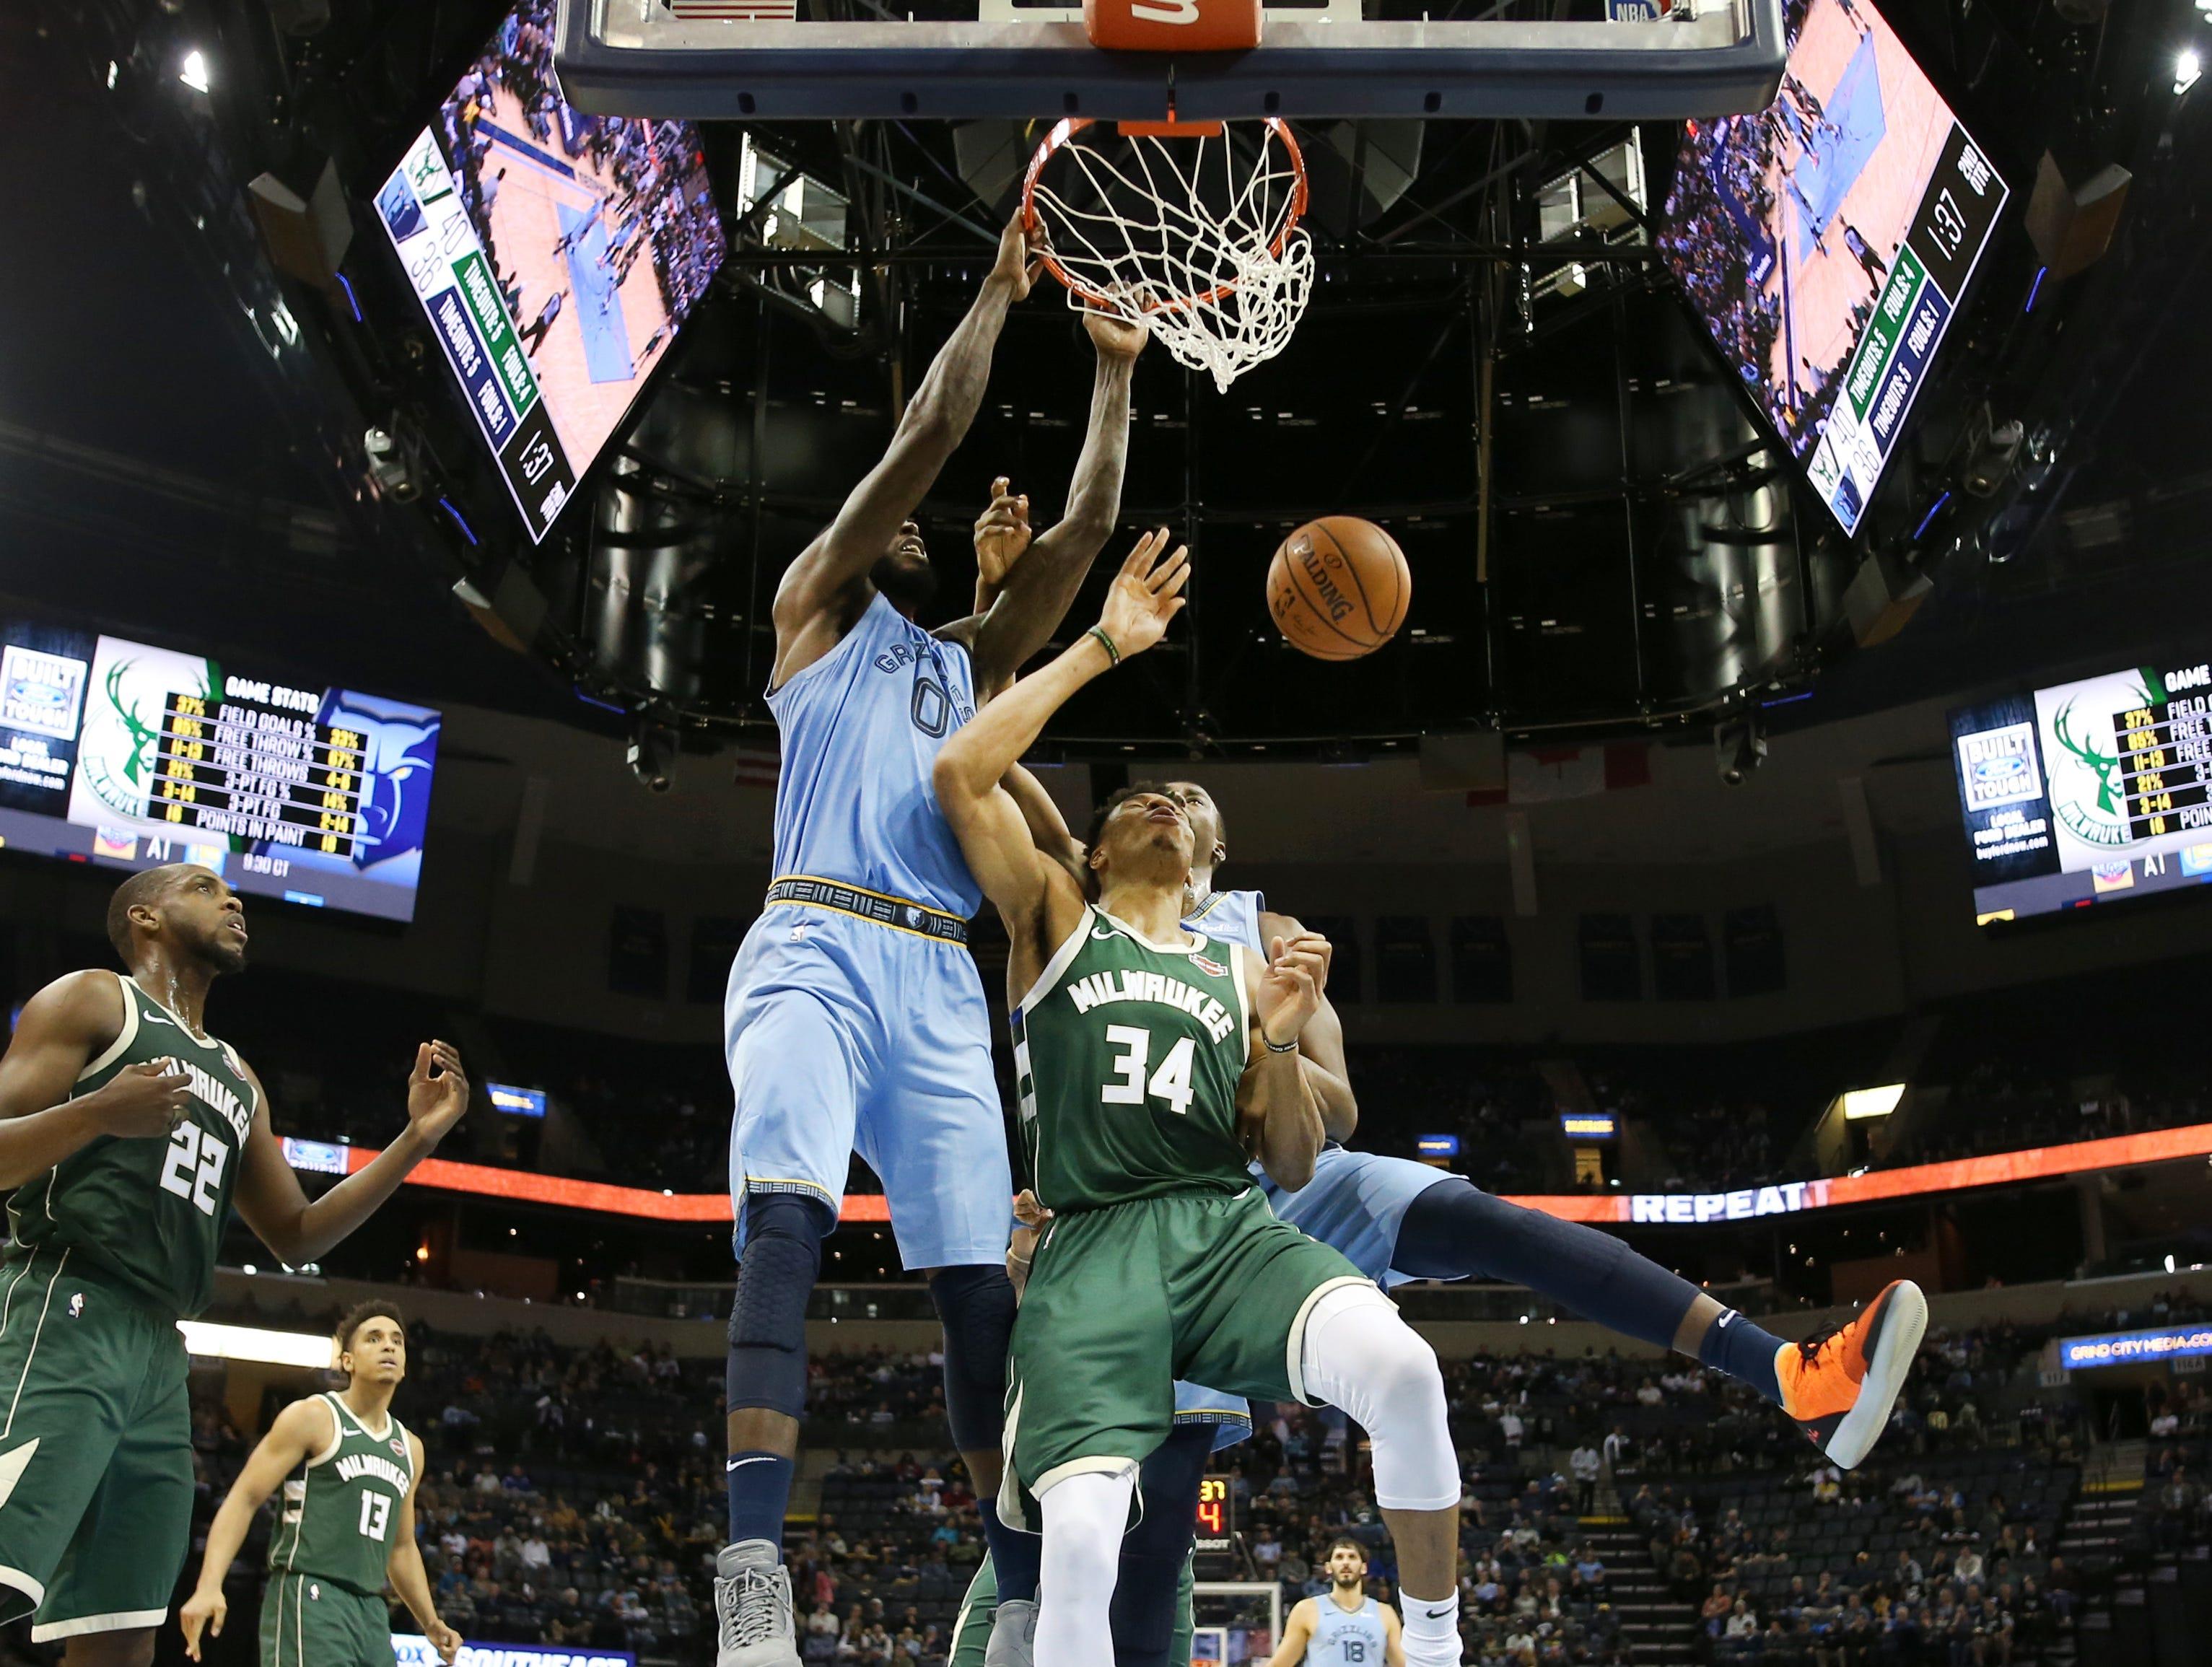 Memphis Grizzlies forward JaMychal Green dunks the ball against the Milwaukee Bucks forward Giannis Antetokounmpo during their game at the FedExForum on Wednesday, Jan. 16, 2019.